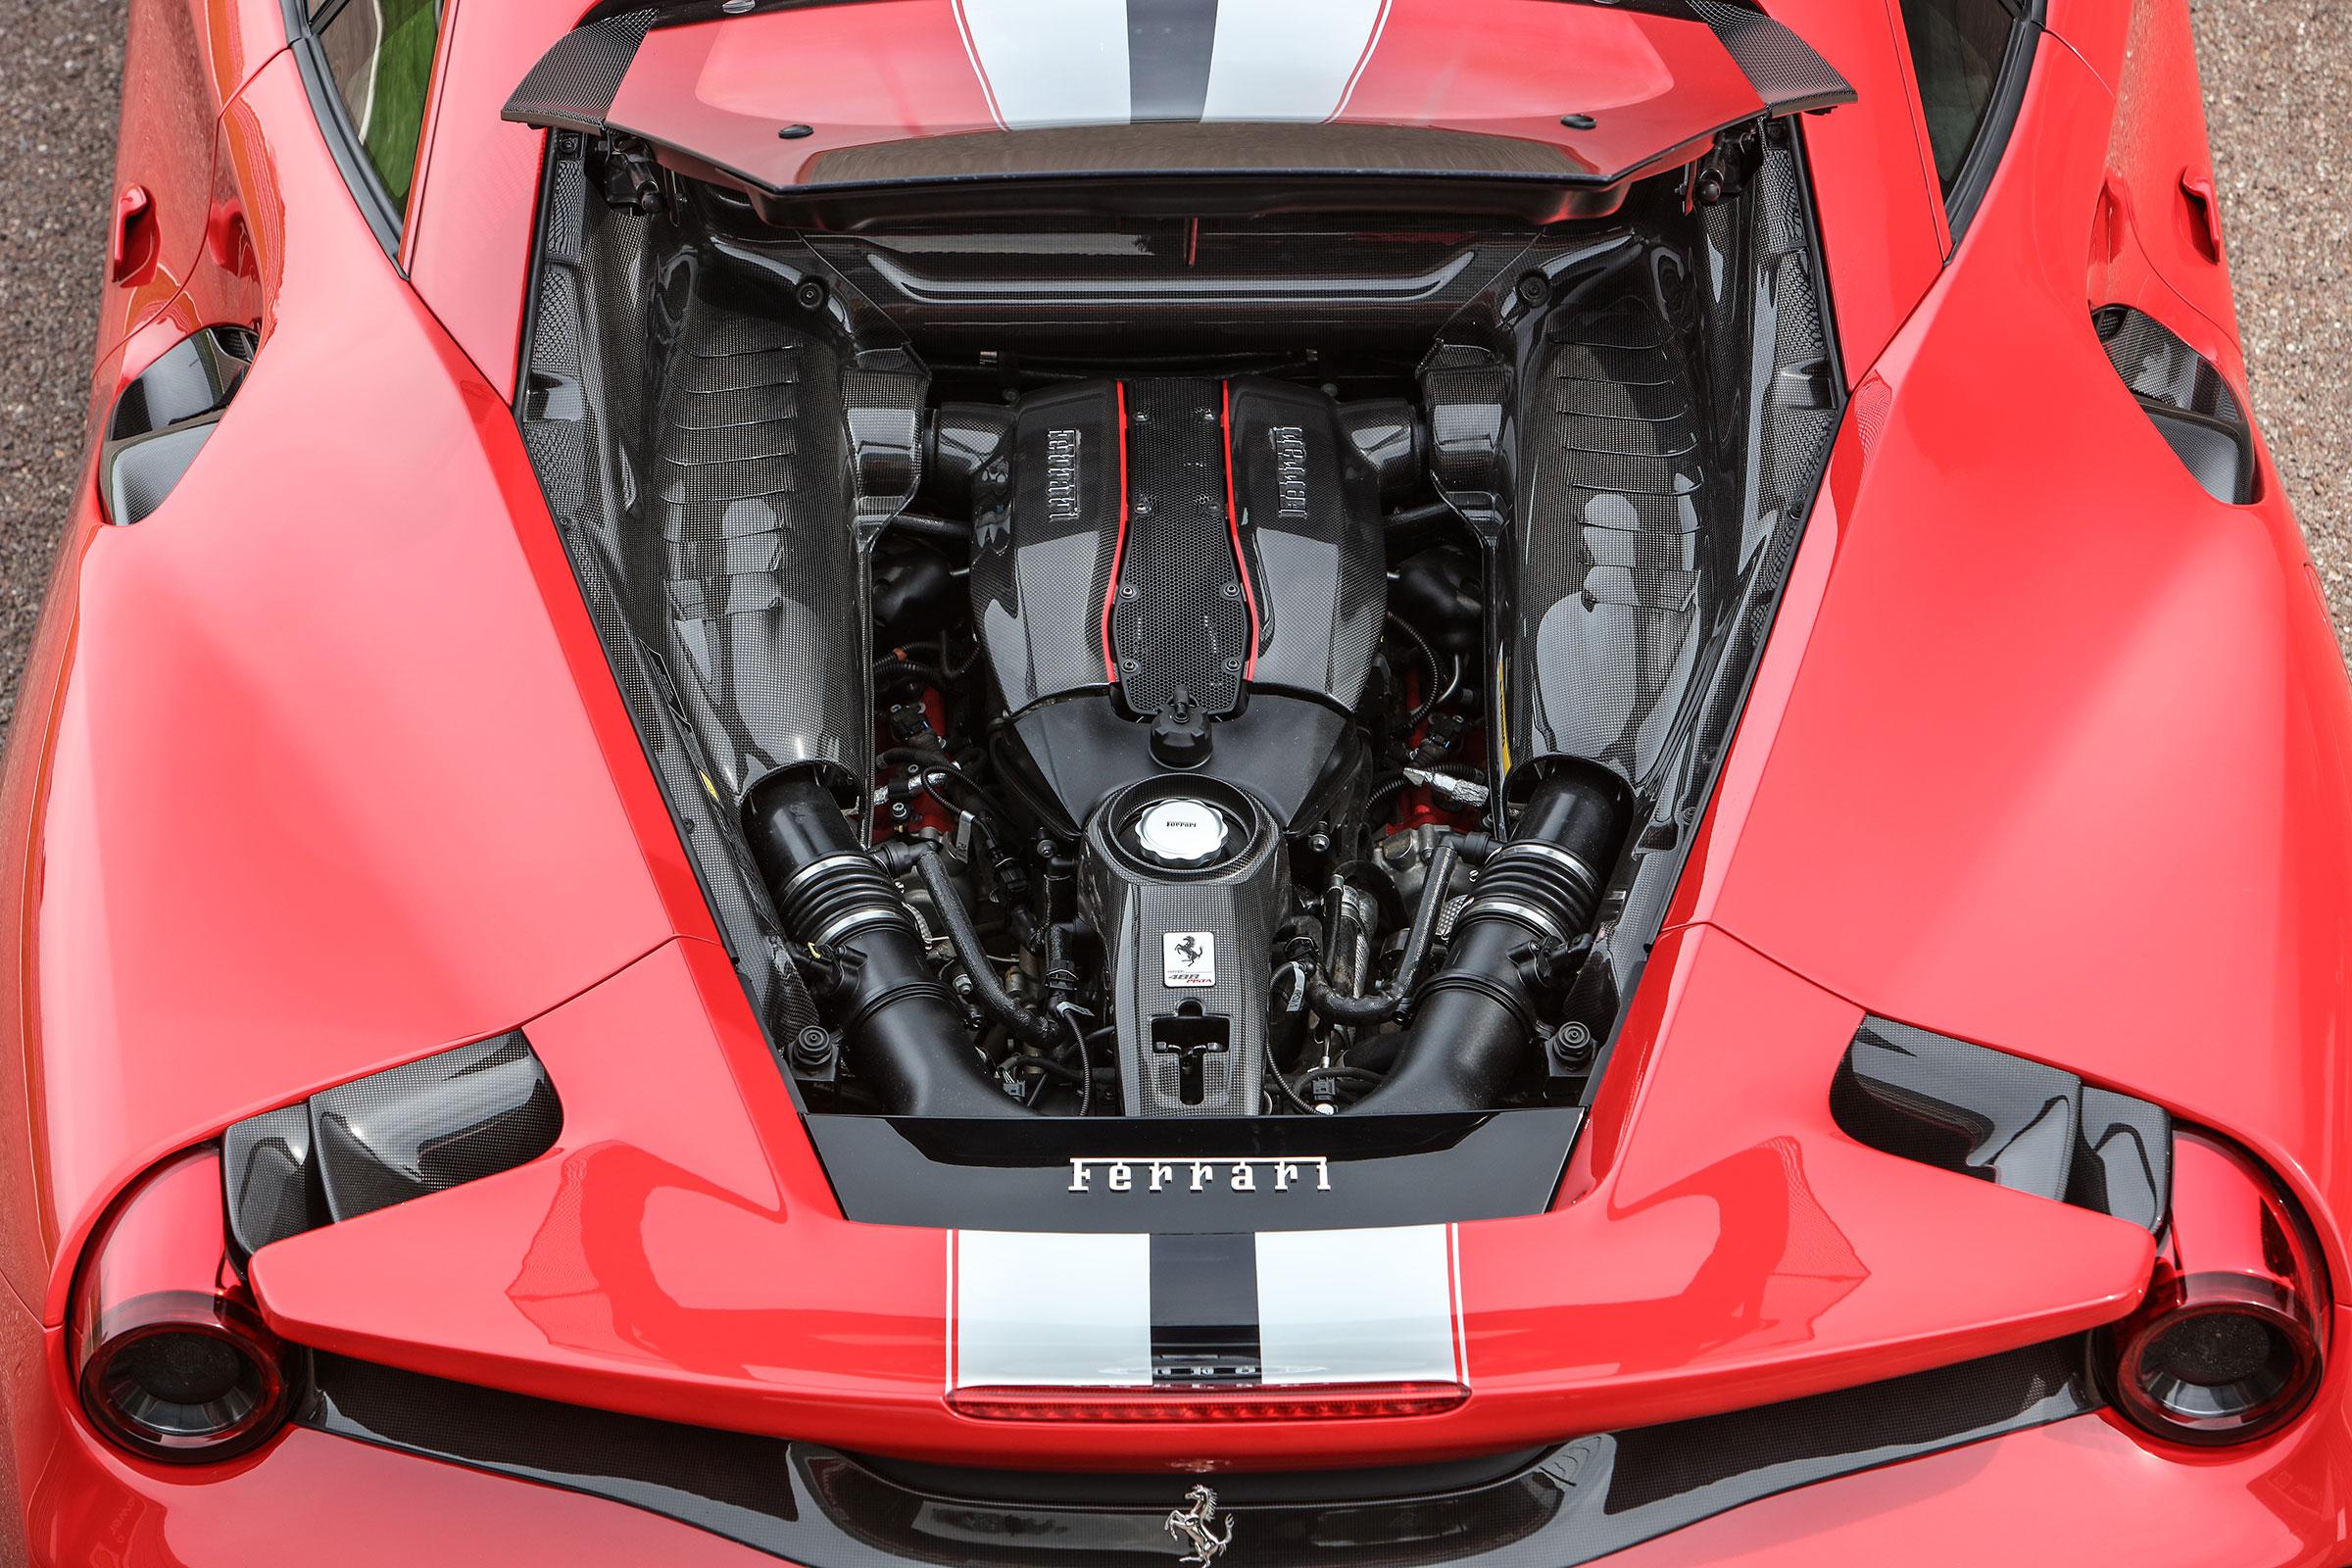 Audi Rs5 2018 >> 2018 international Engine of the Year Awards: Ferrari 3.9 ...